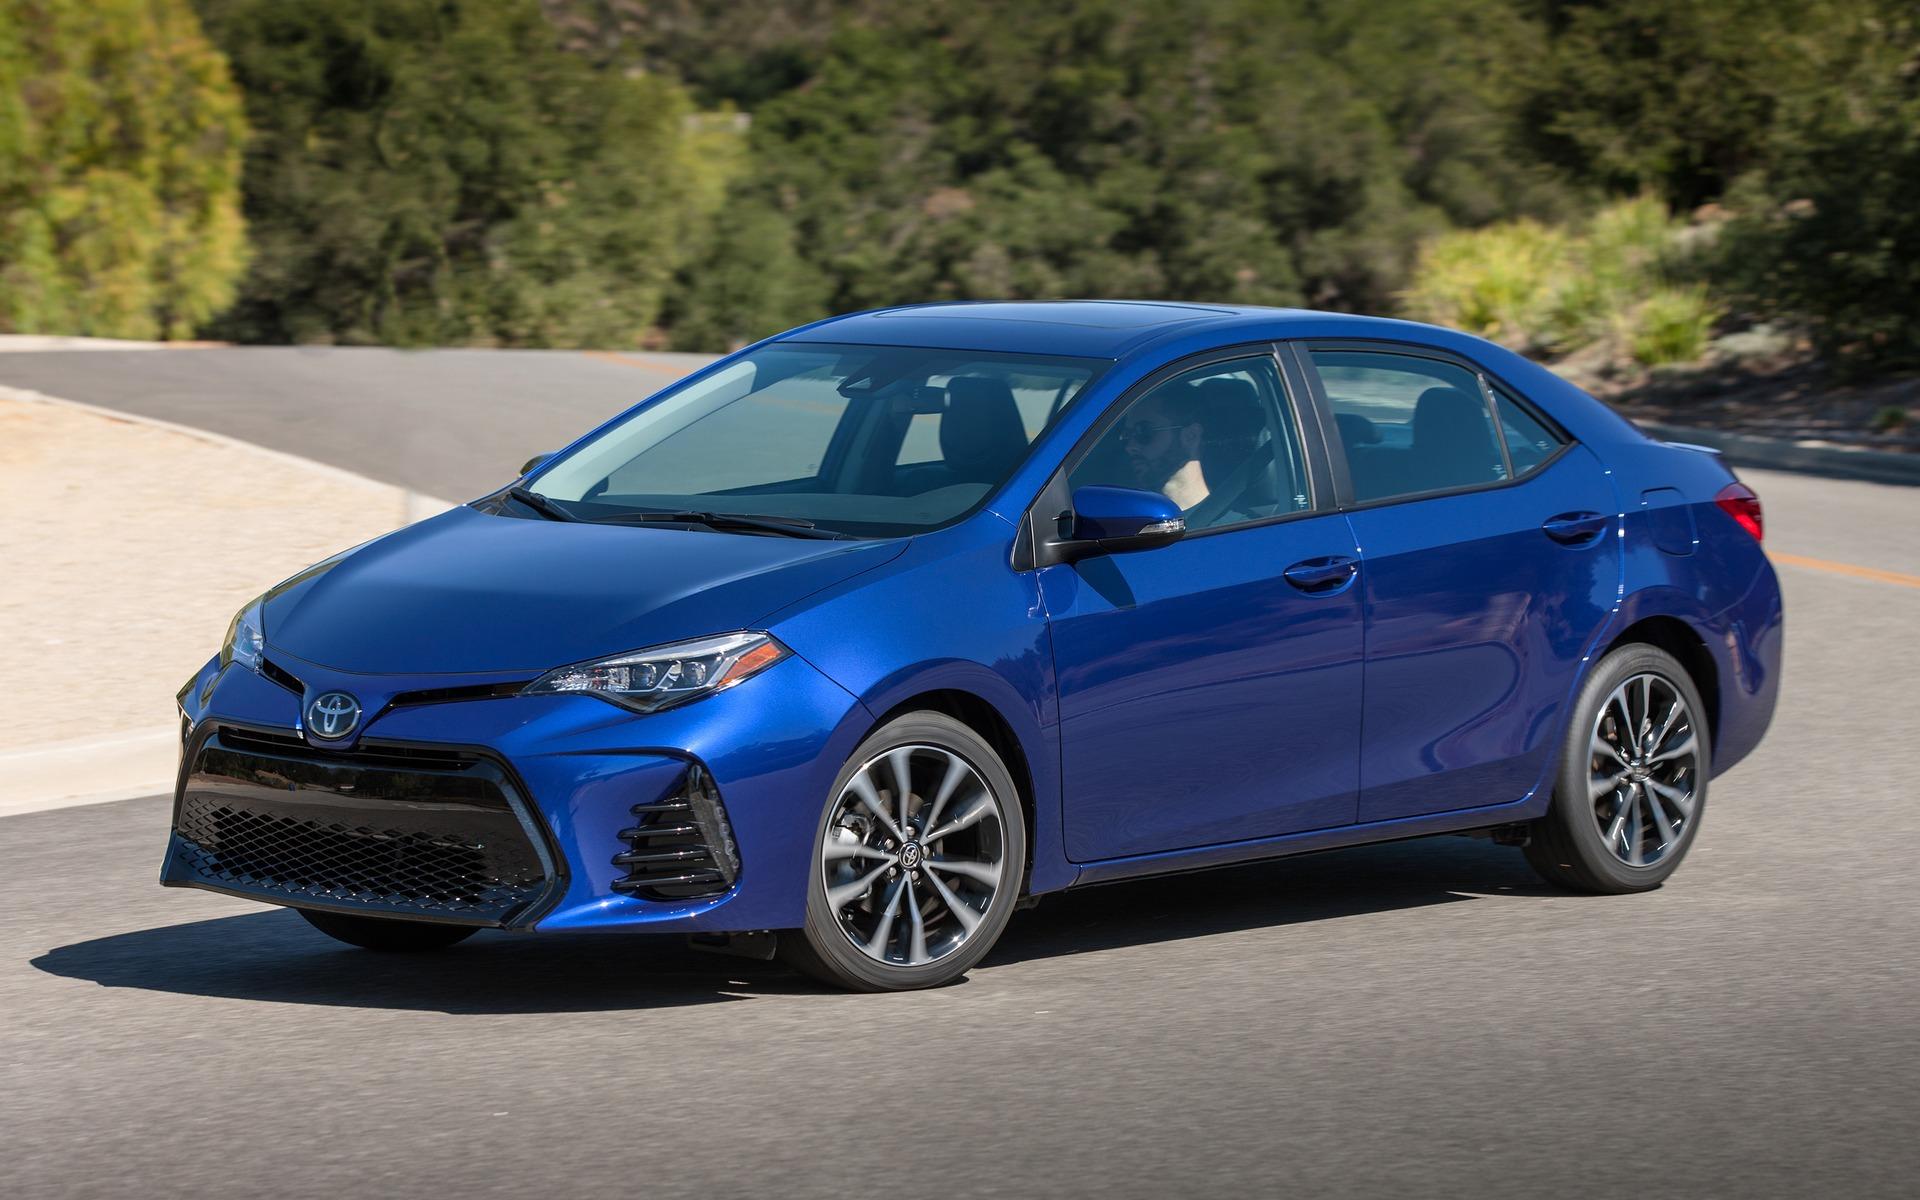 Kekurangan Toyota Corolla 2019 Sedan Murah Berkualitas